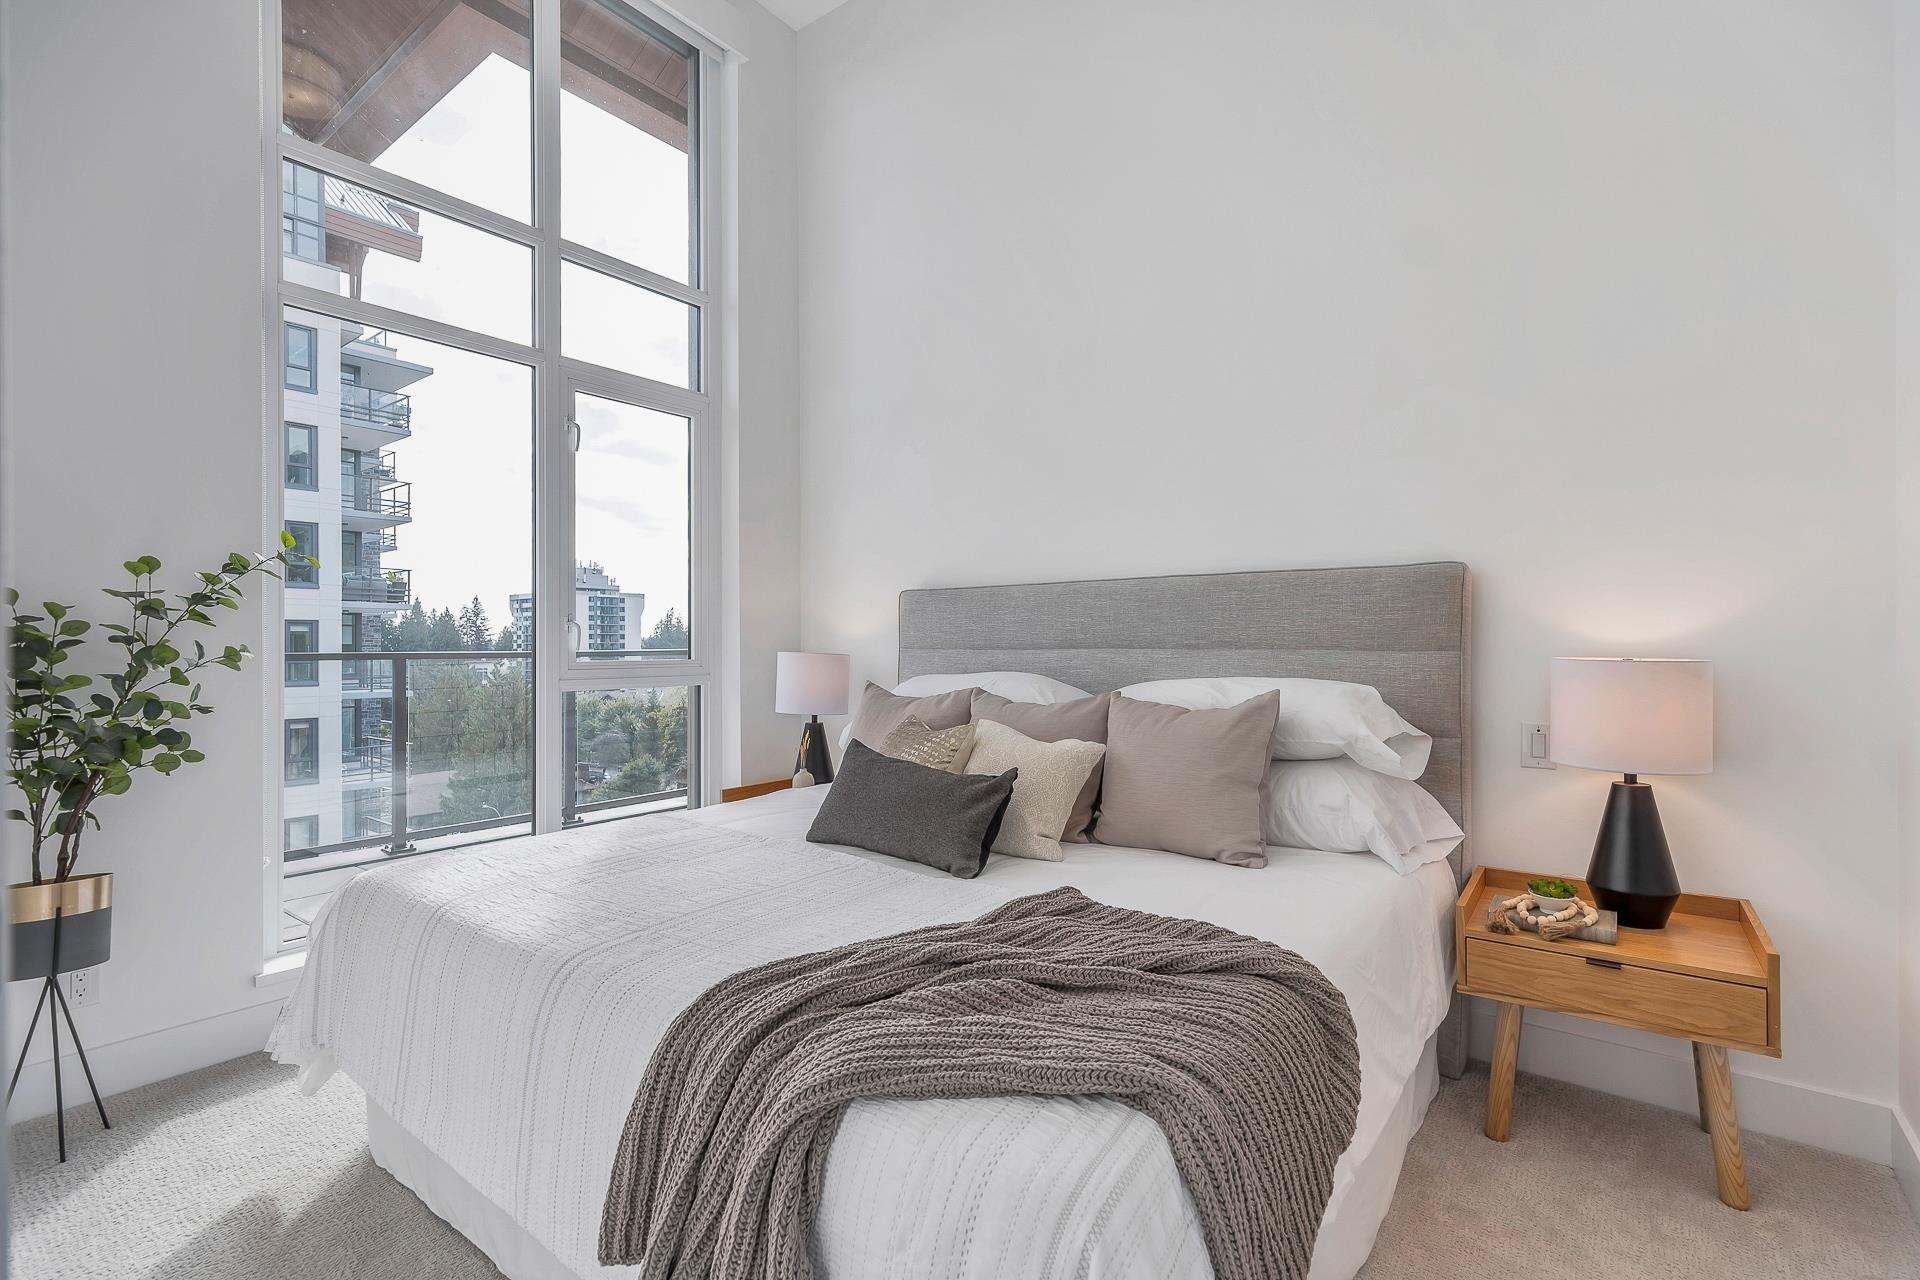 702 2780 VALLEY CENTRE AVENUE - Lynn Valley Apartment/Condo for sale, 3 Bedrooms (R2622279) - #11